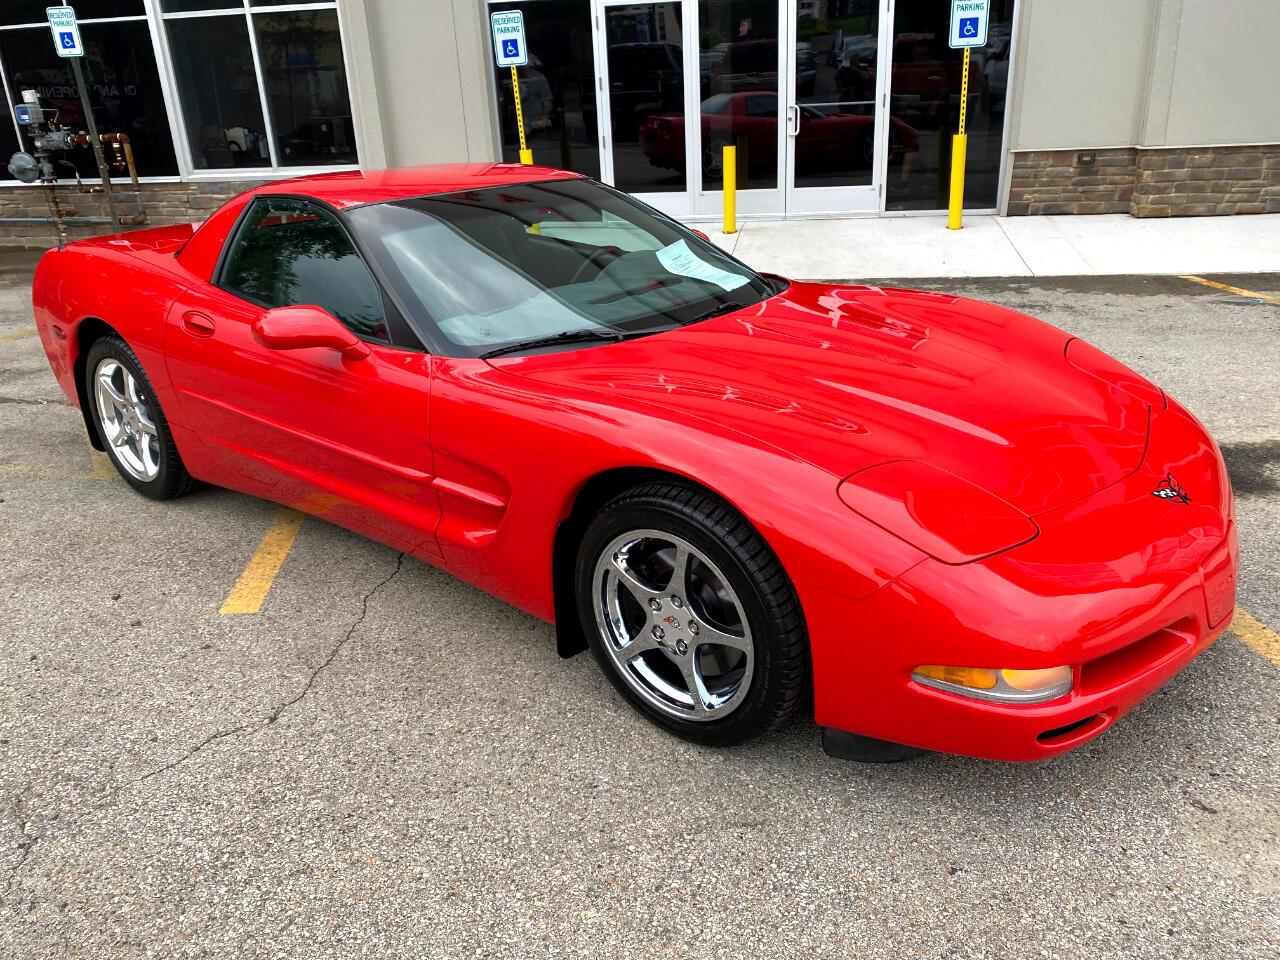 Chevrolet Corvette Hardtop 2000